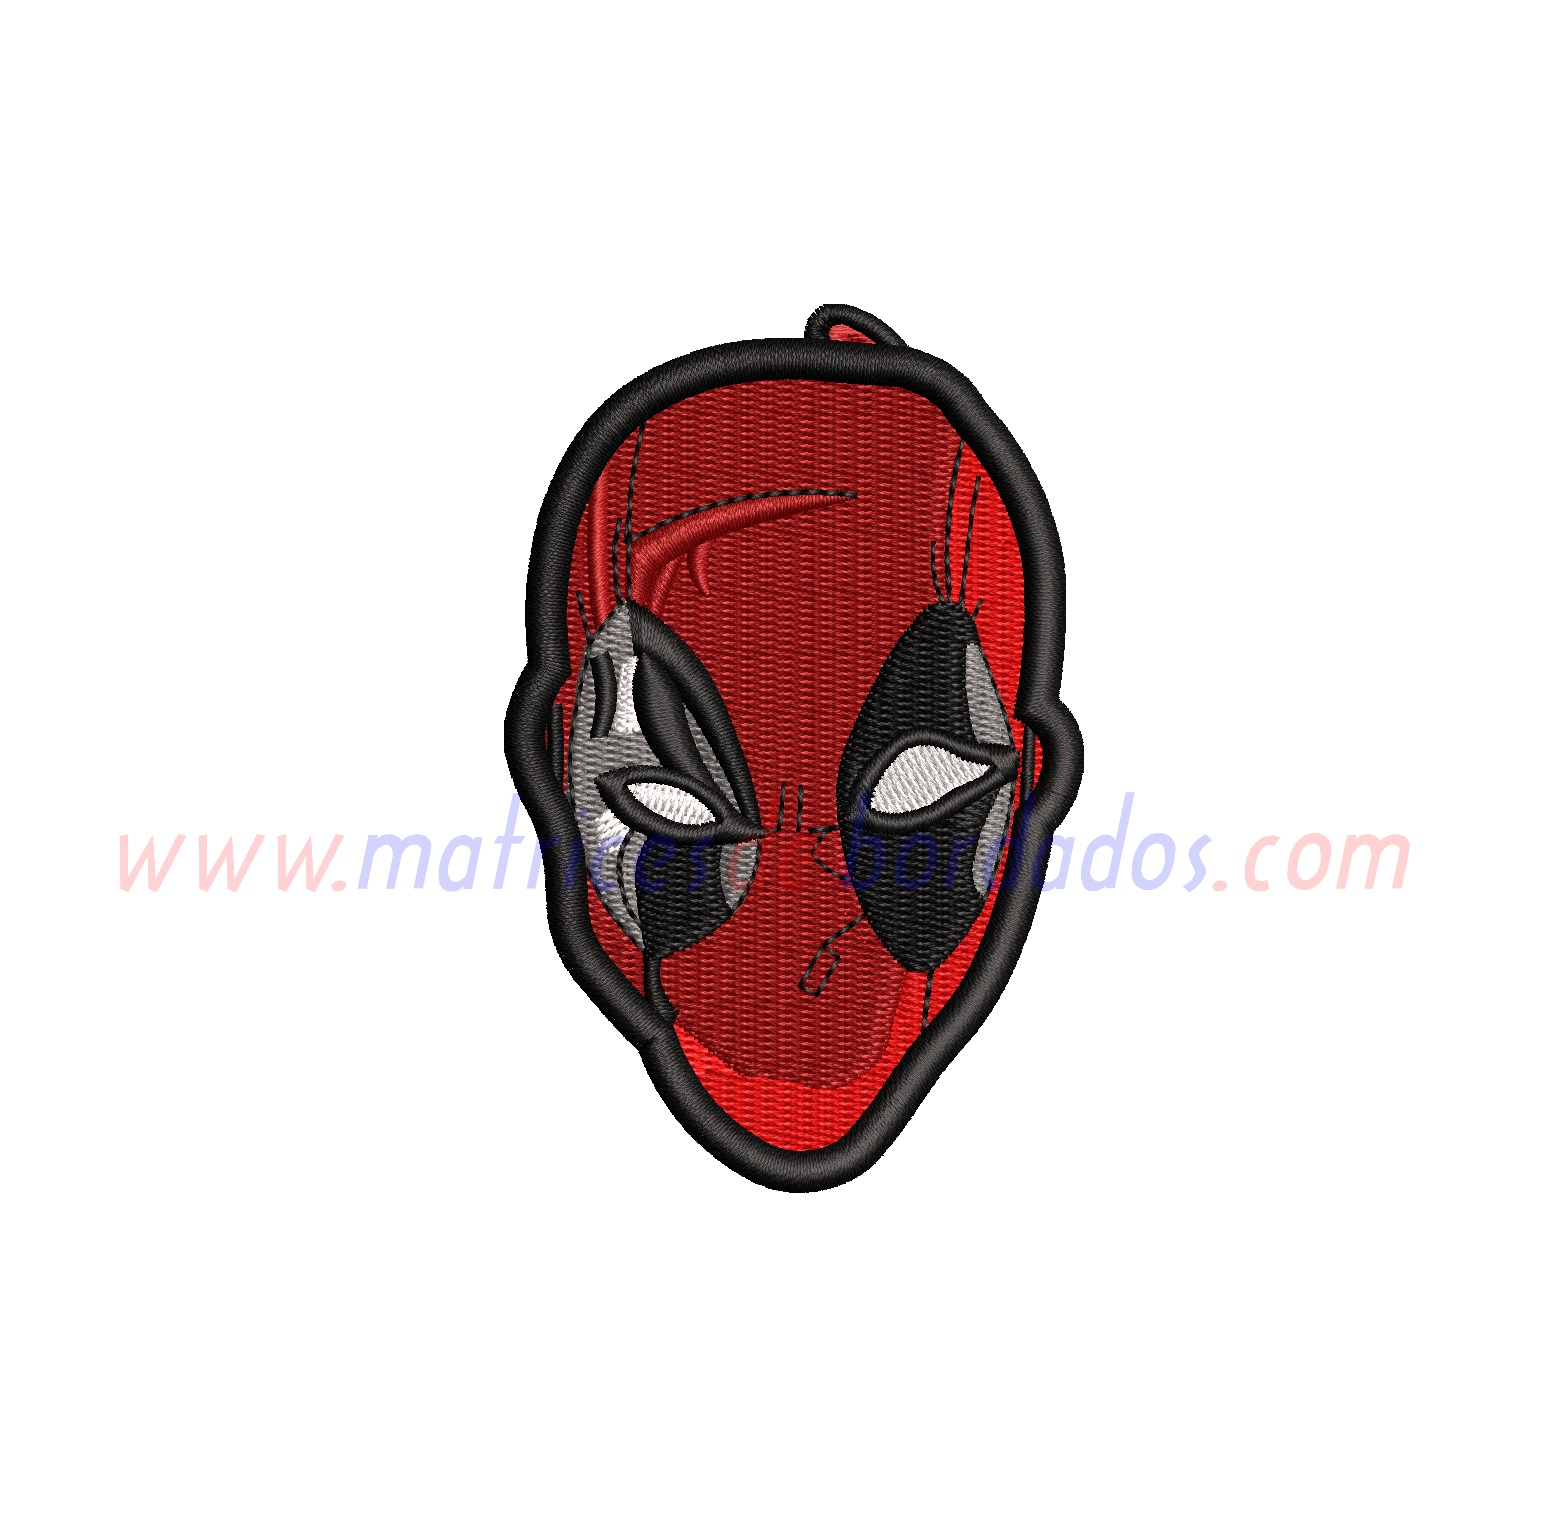 KU99YE - Deadpool